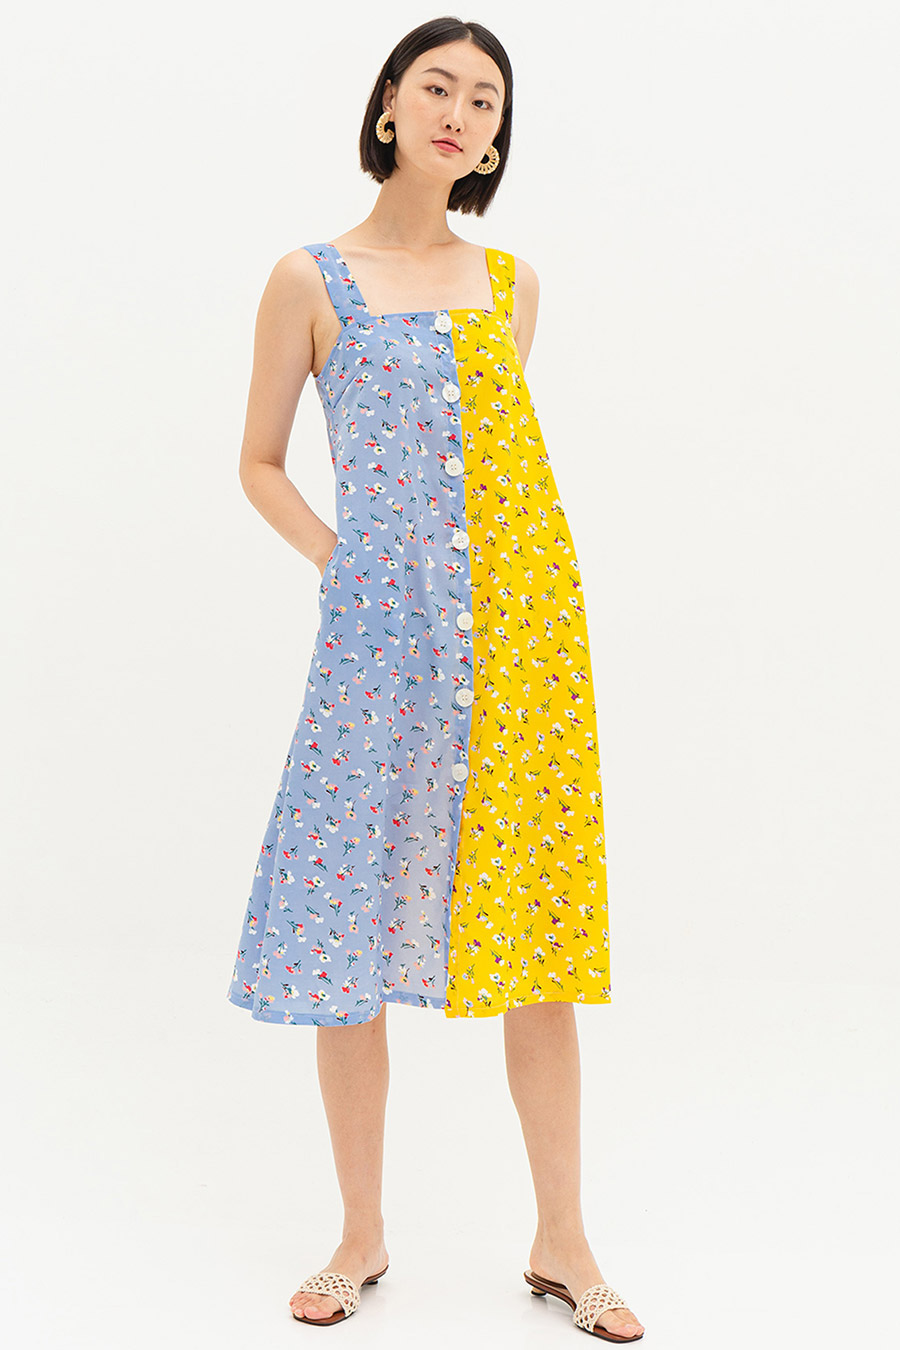 SAKYA DRESS - KIKYO [BY MODPARADE]